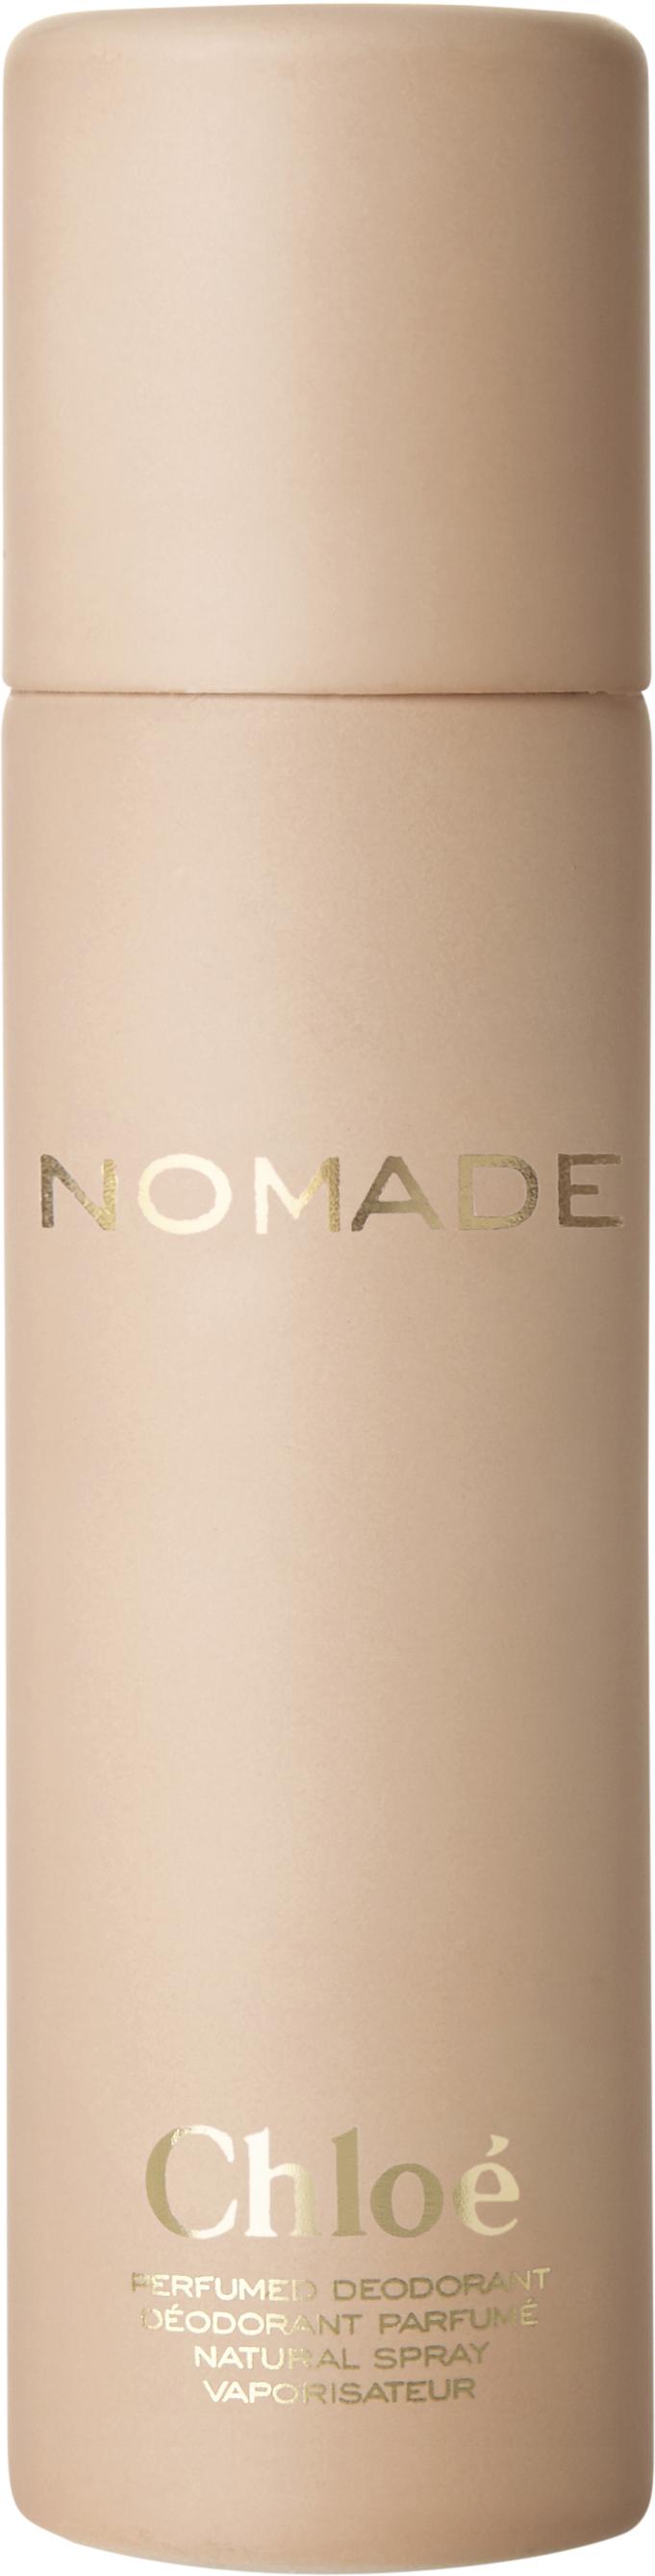 Chloe - Nomade Deodorant Spray 100 ml